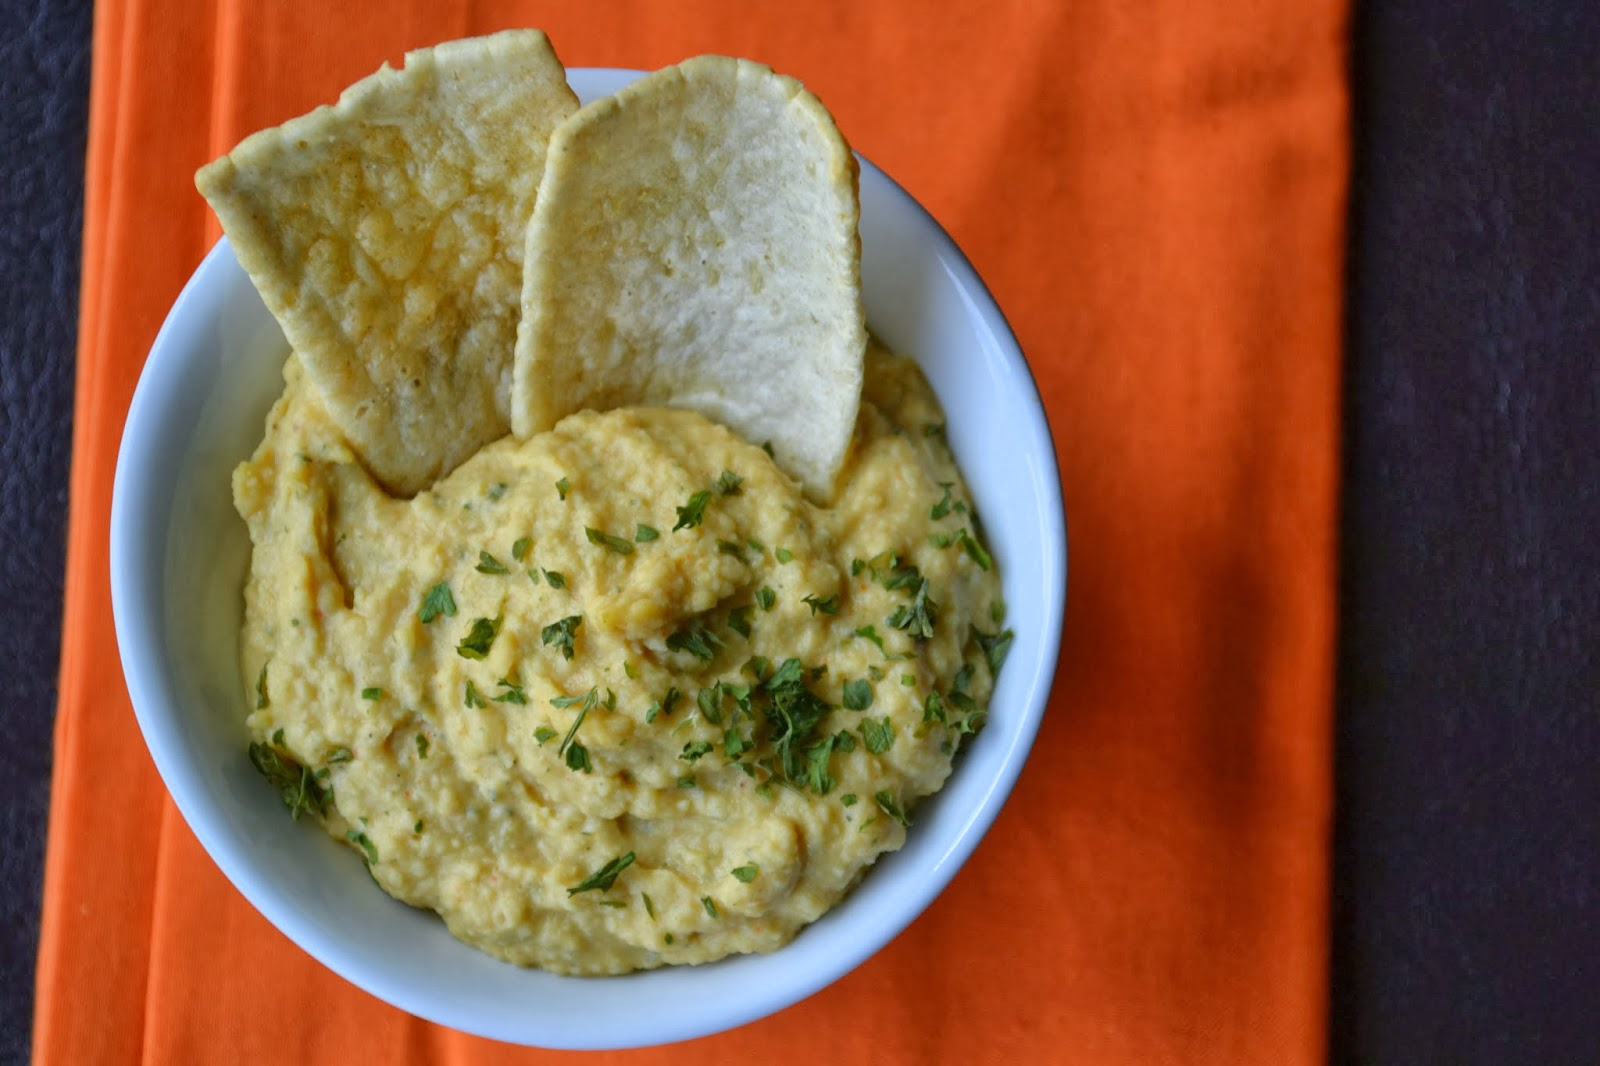 how to make garlic hummus without tahini